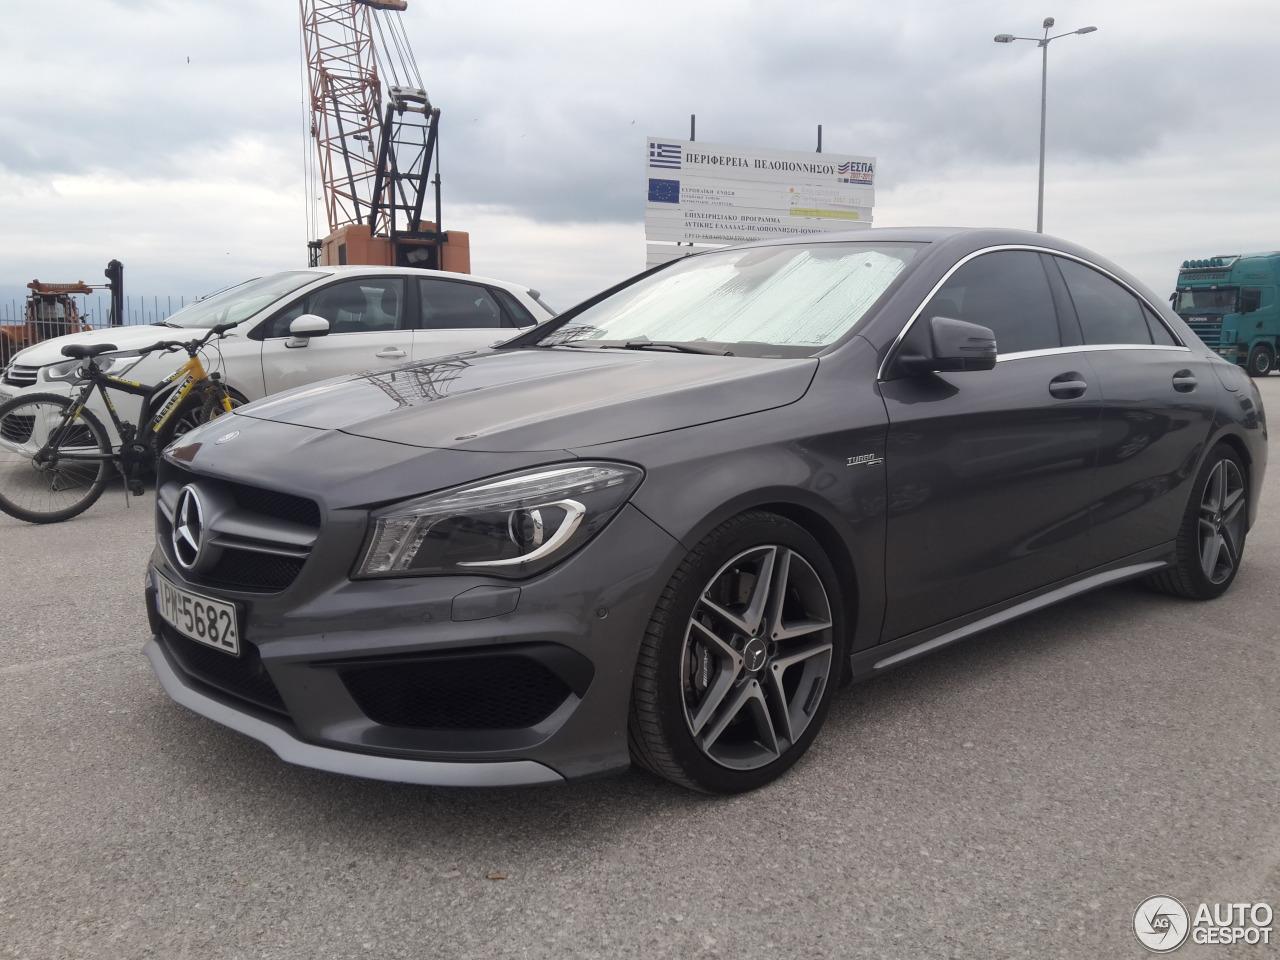 Mercedes benz cla 45 amg c117 30 october 2016 autogespot for Mercedes benz cla 250 amg price